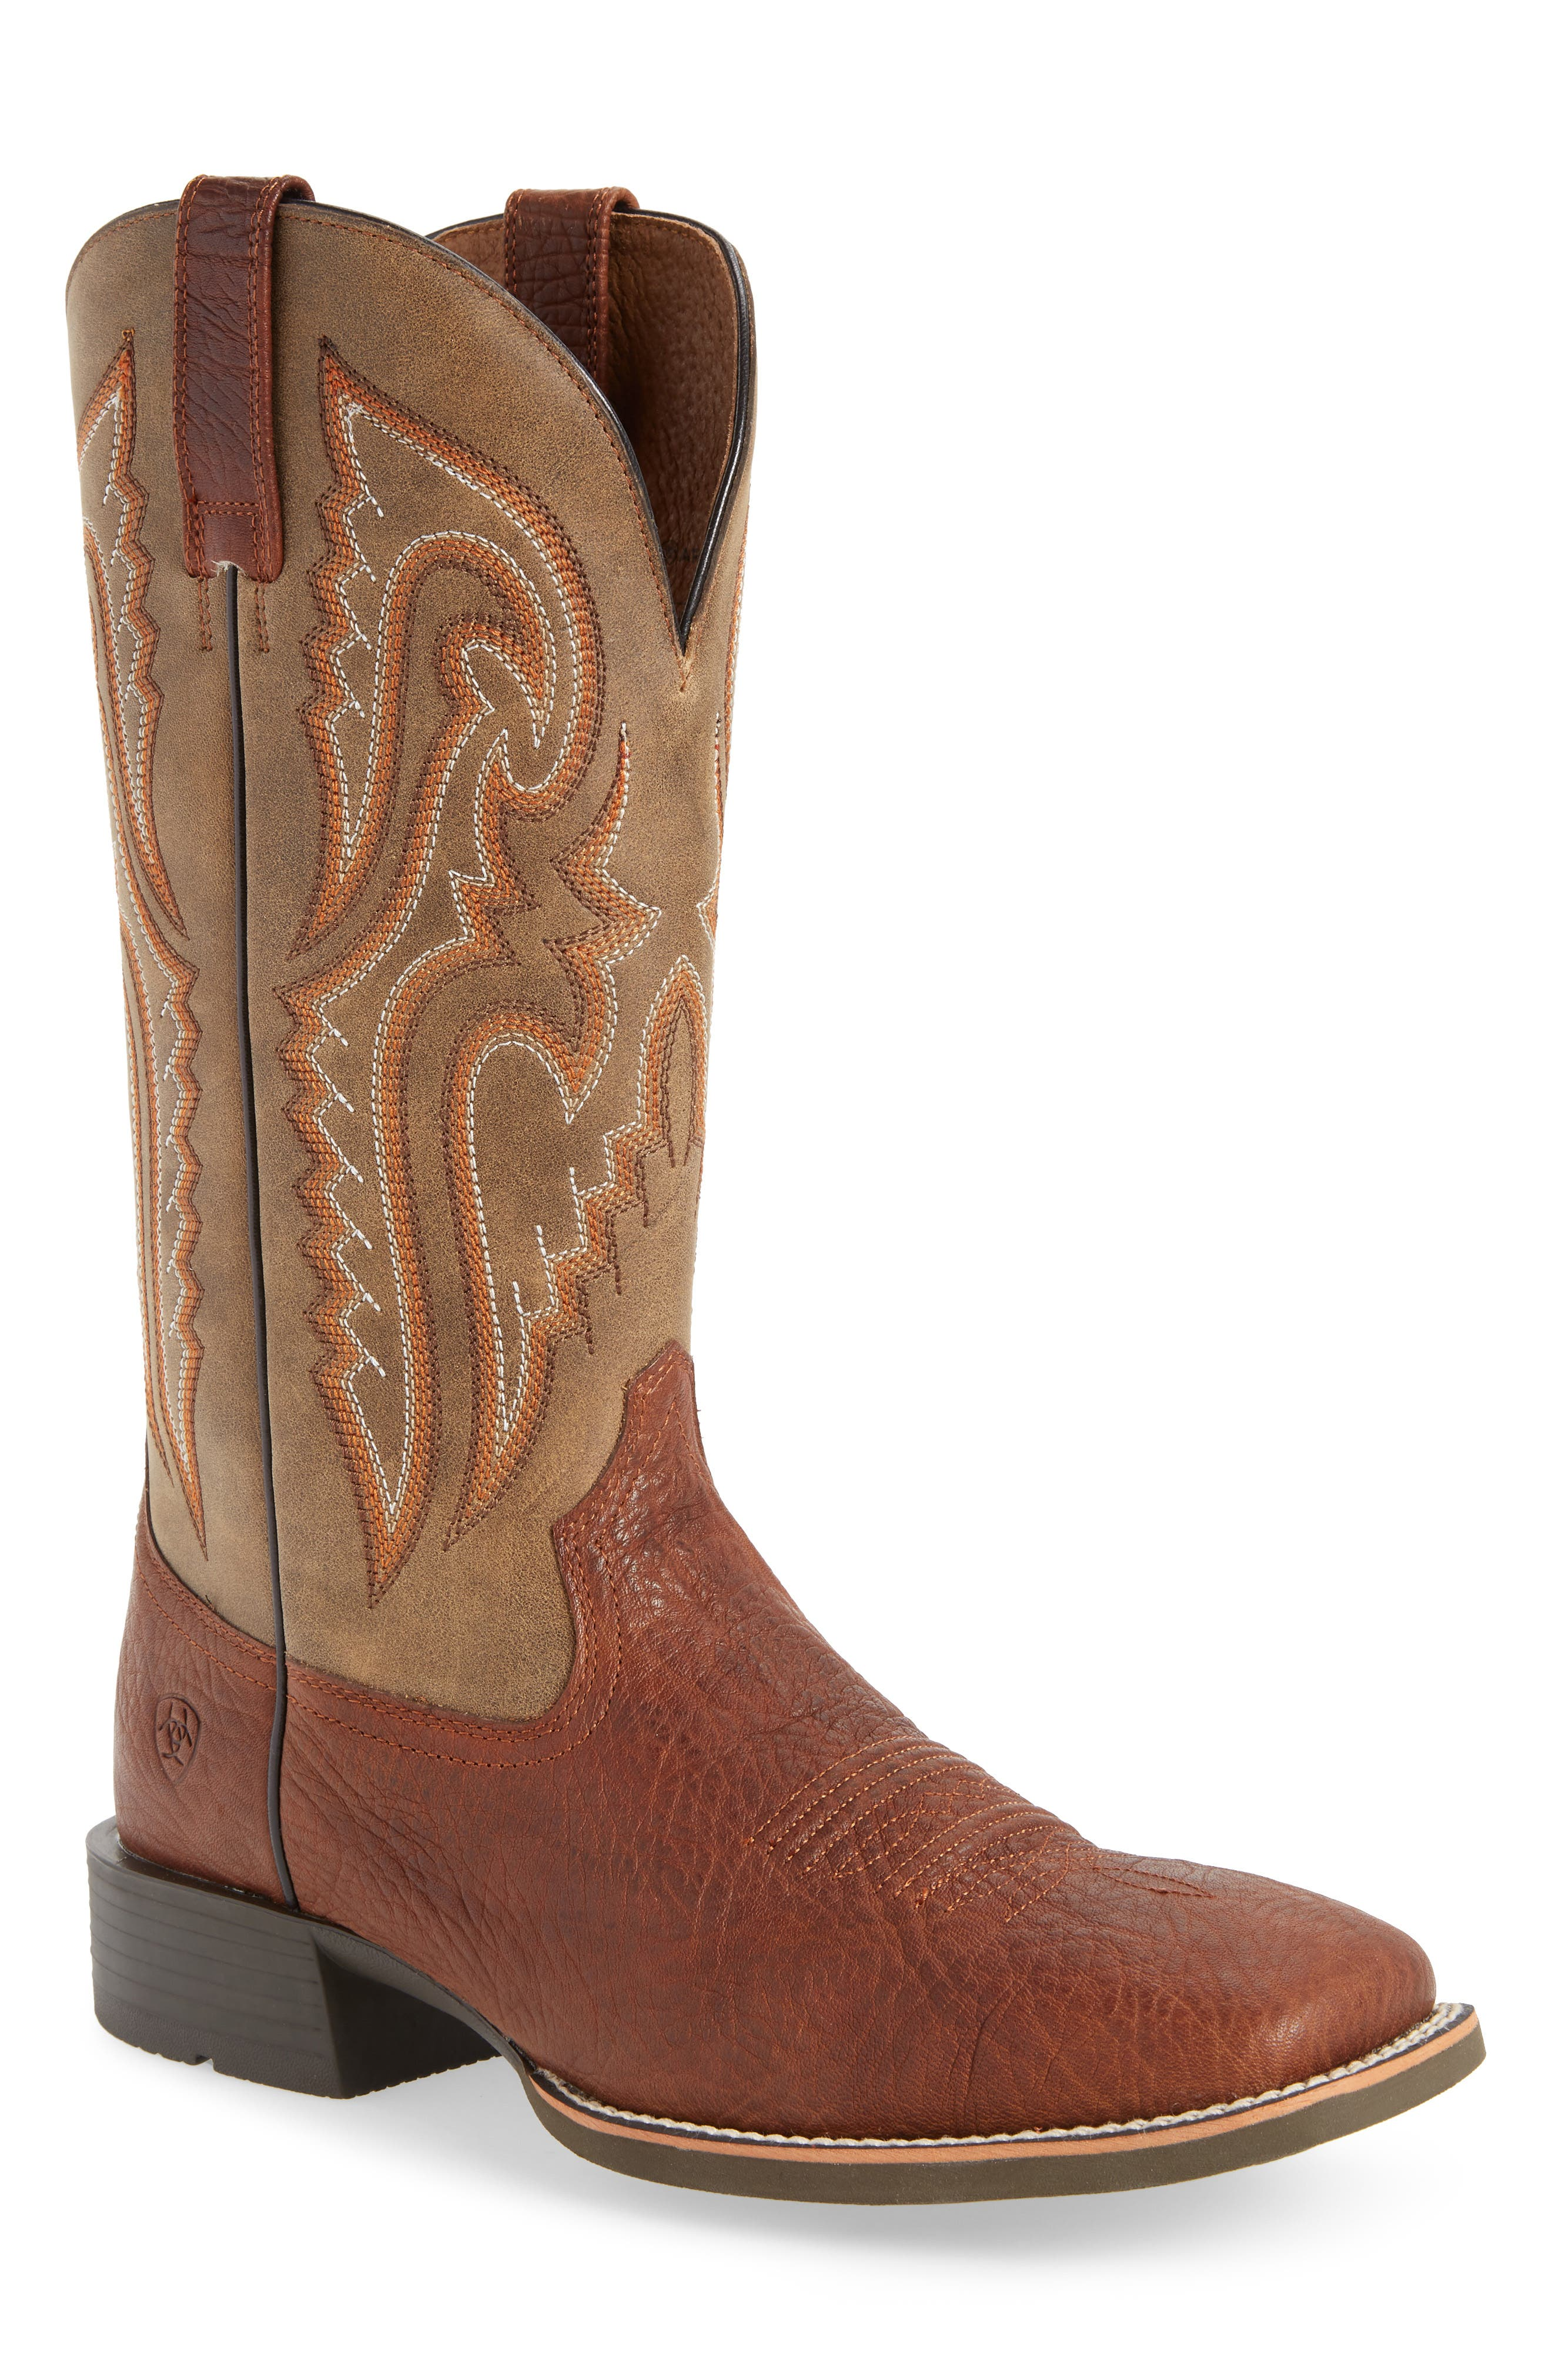 Heritage Latigo Square Toe Cowboy Boot,                             Main thumbnail 1, color,                             COGNAC/ BROWN BOMBER LEATHER